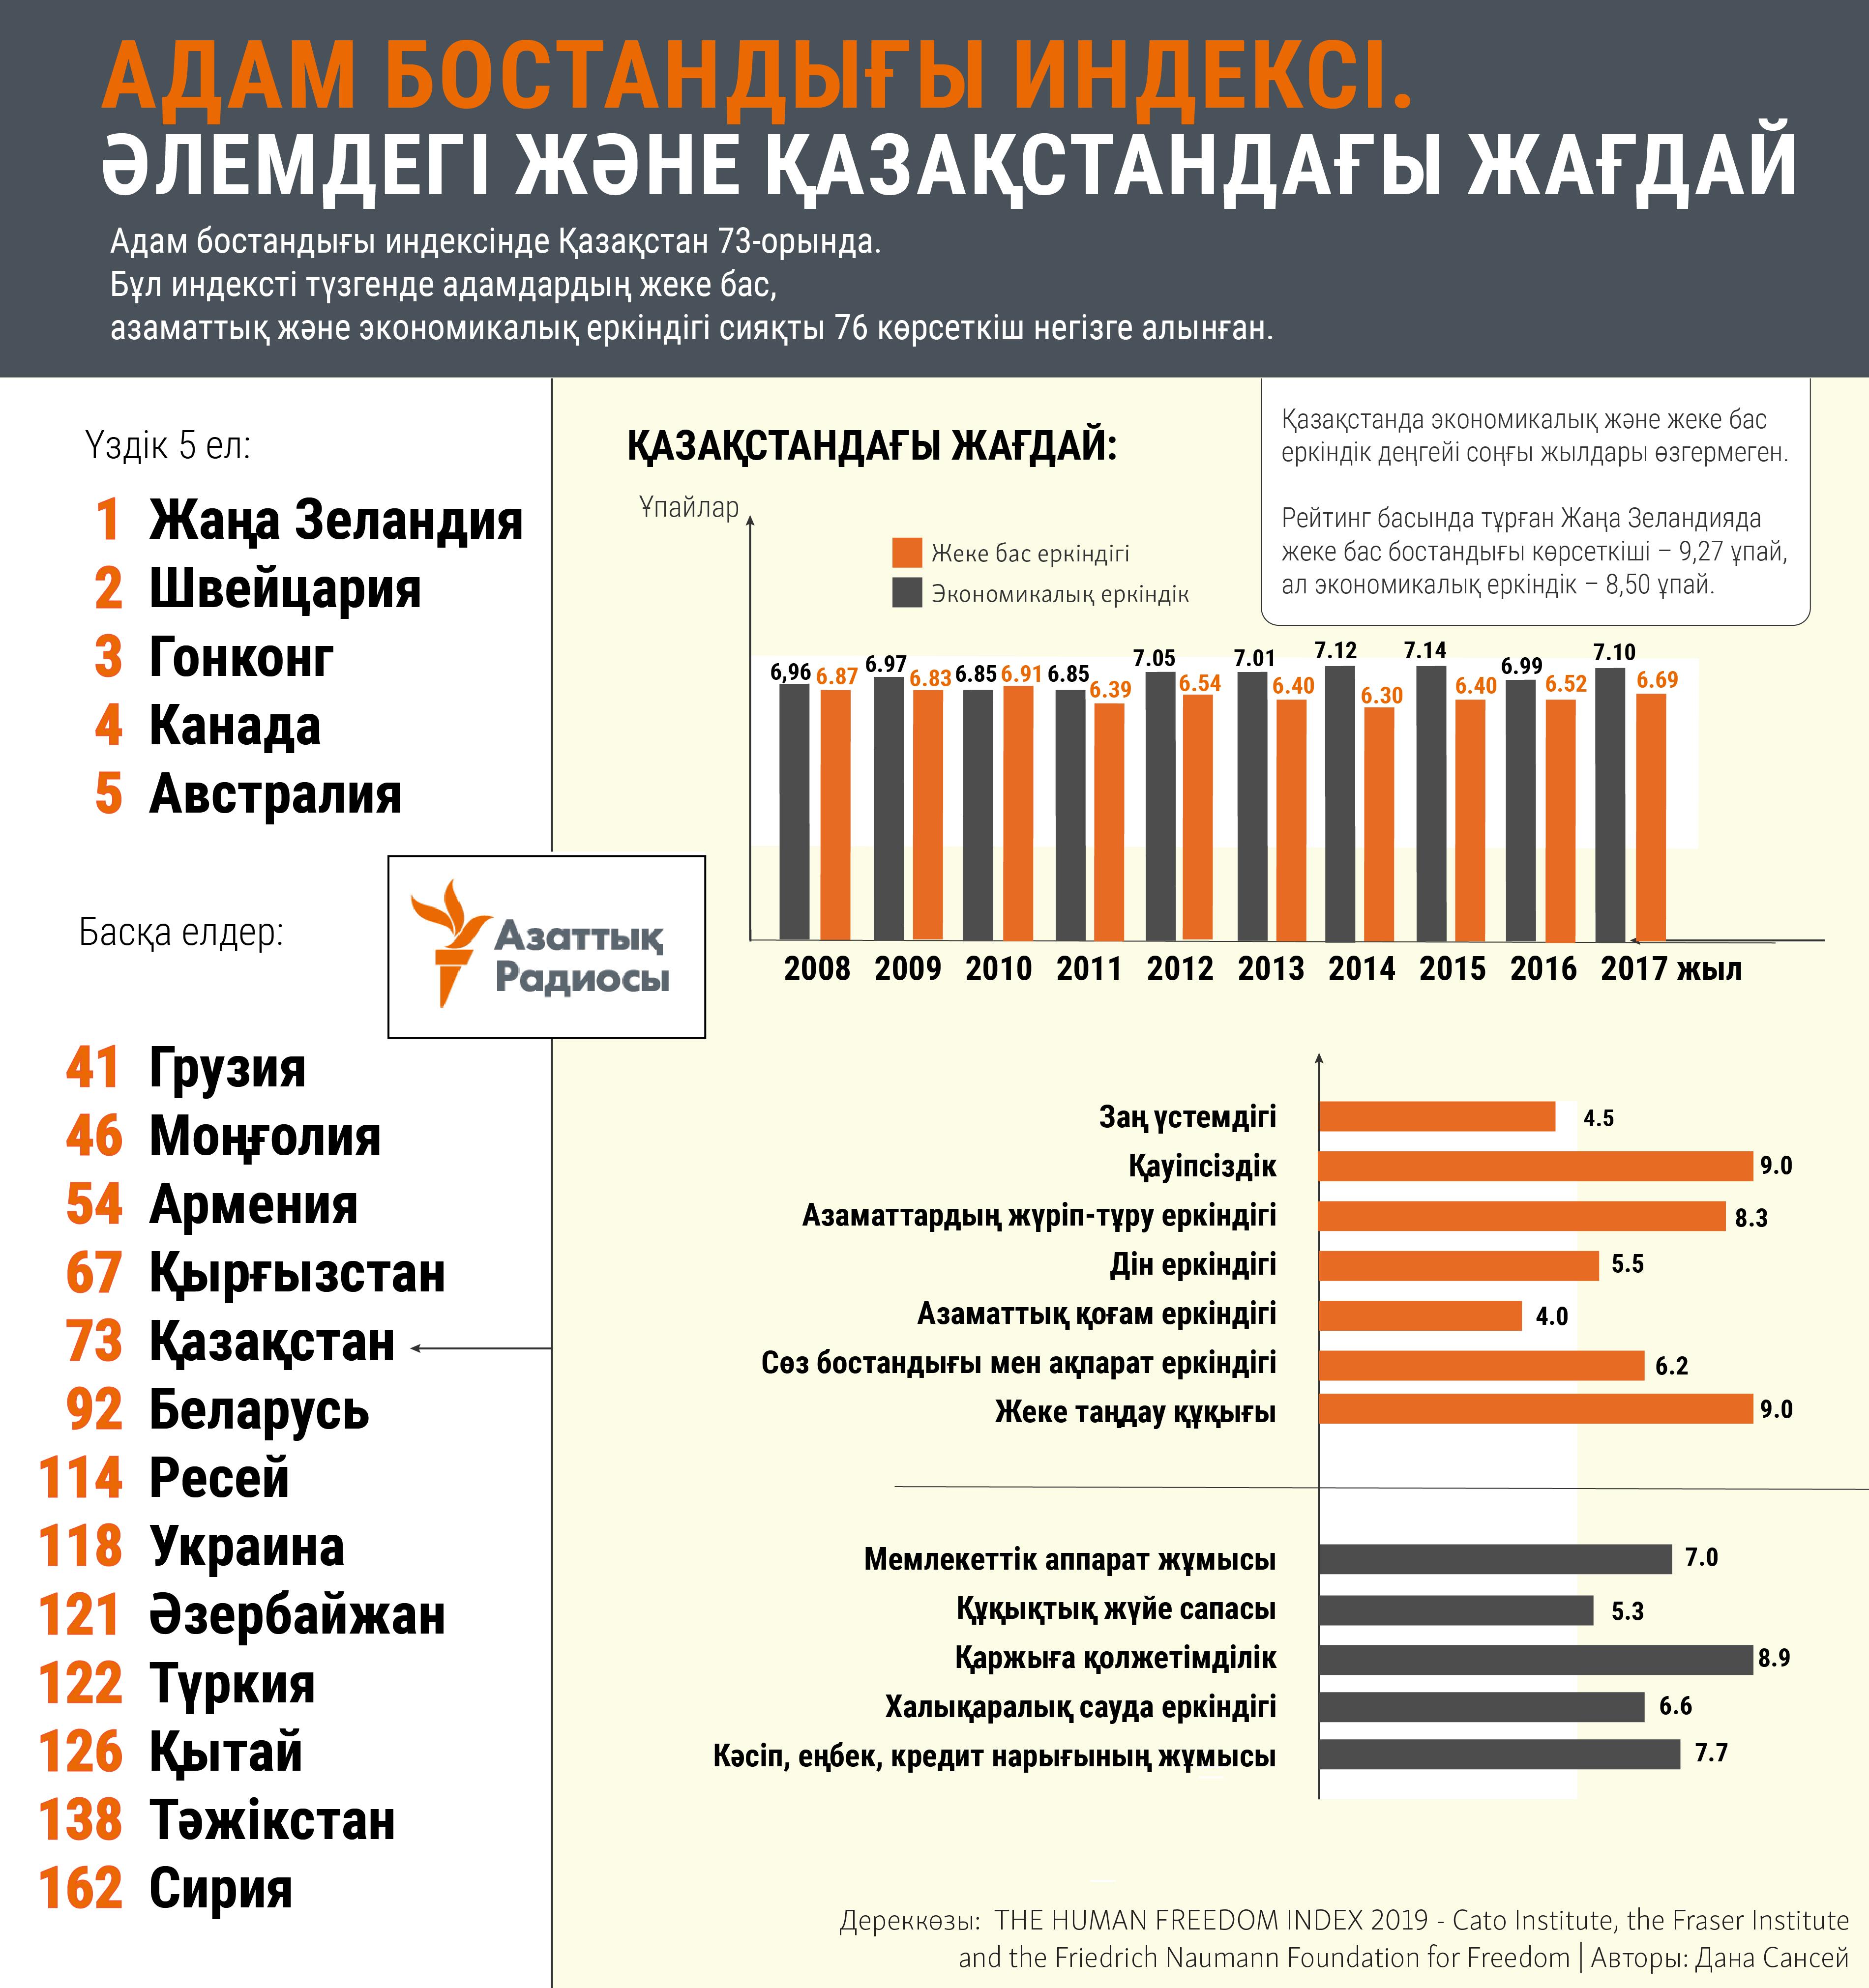 infographic about kazakhstan